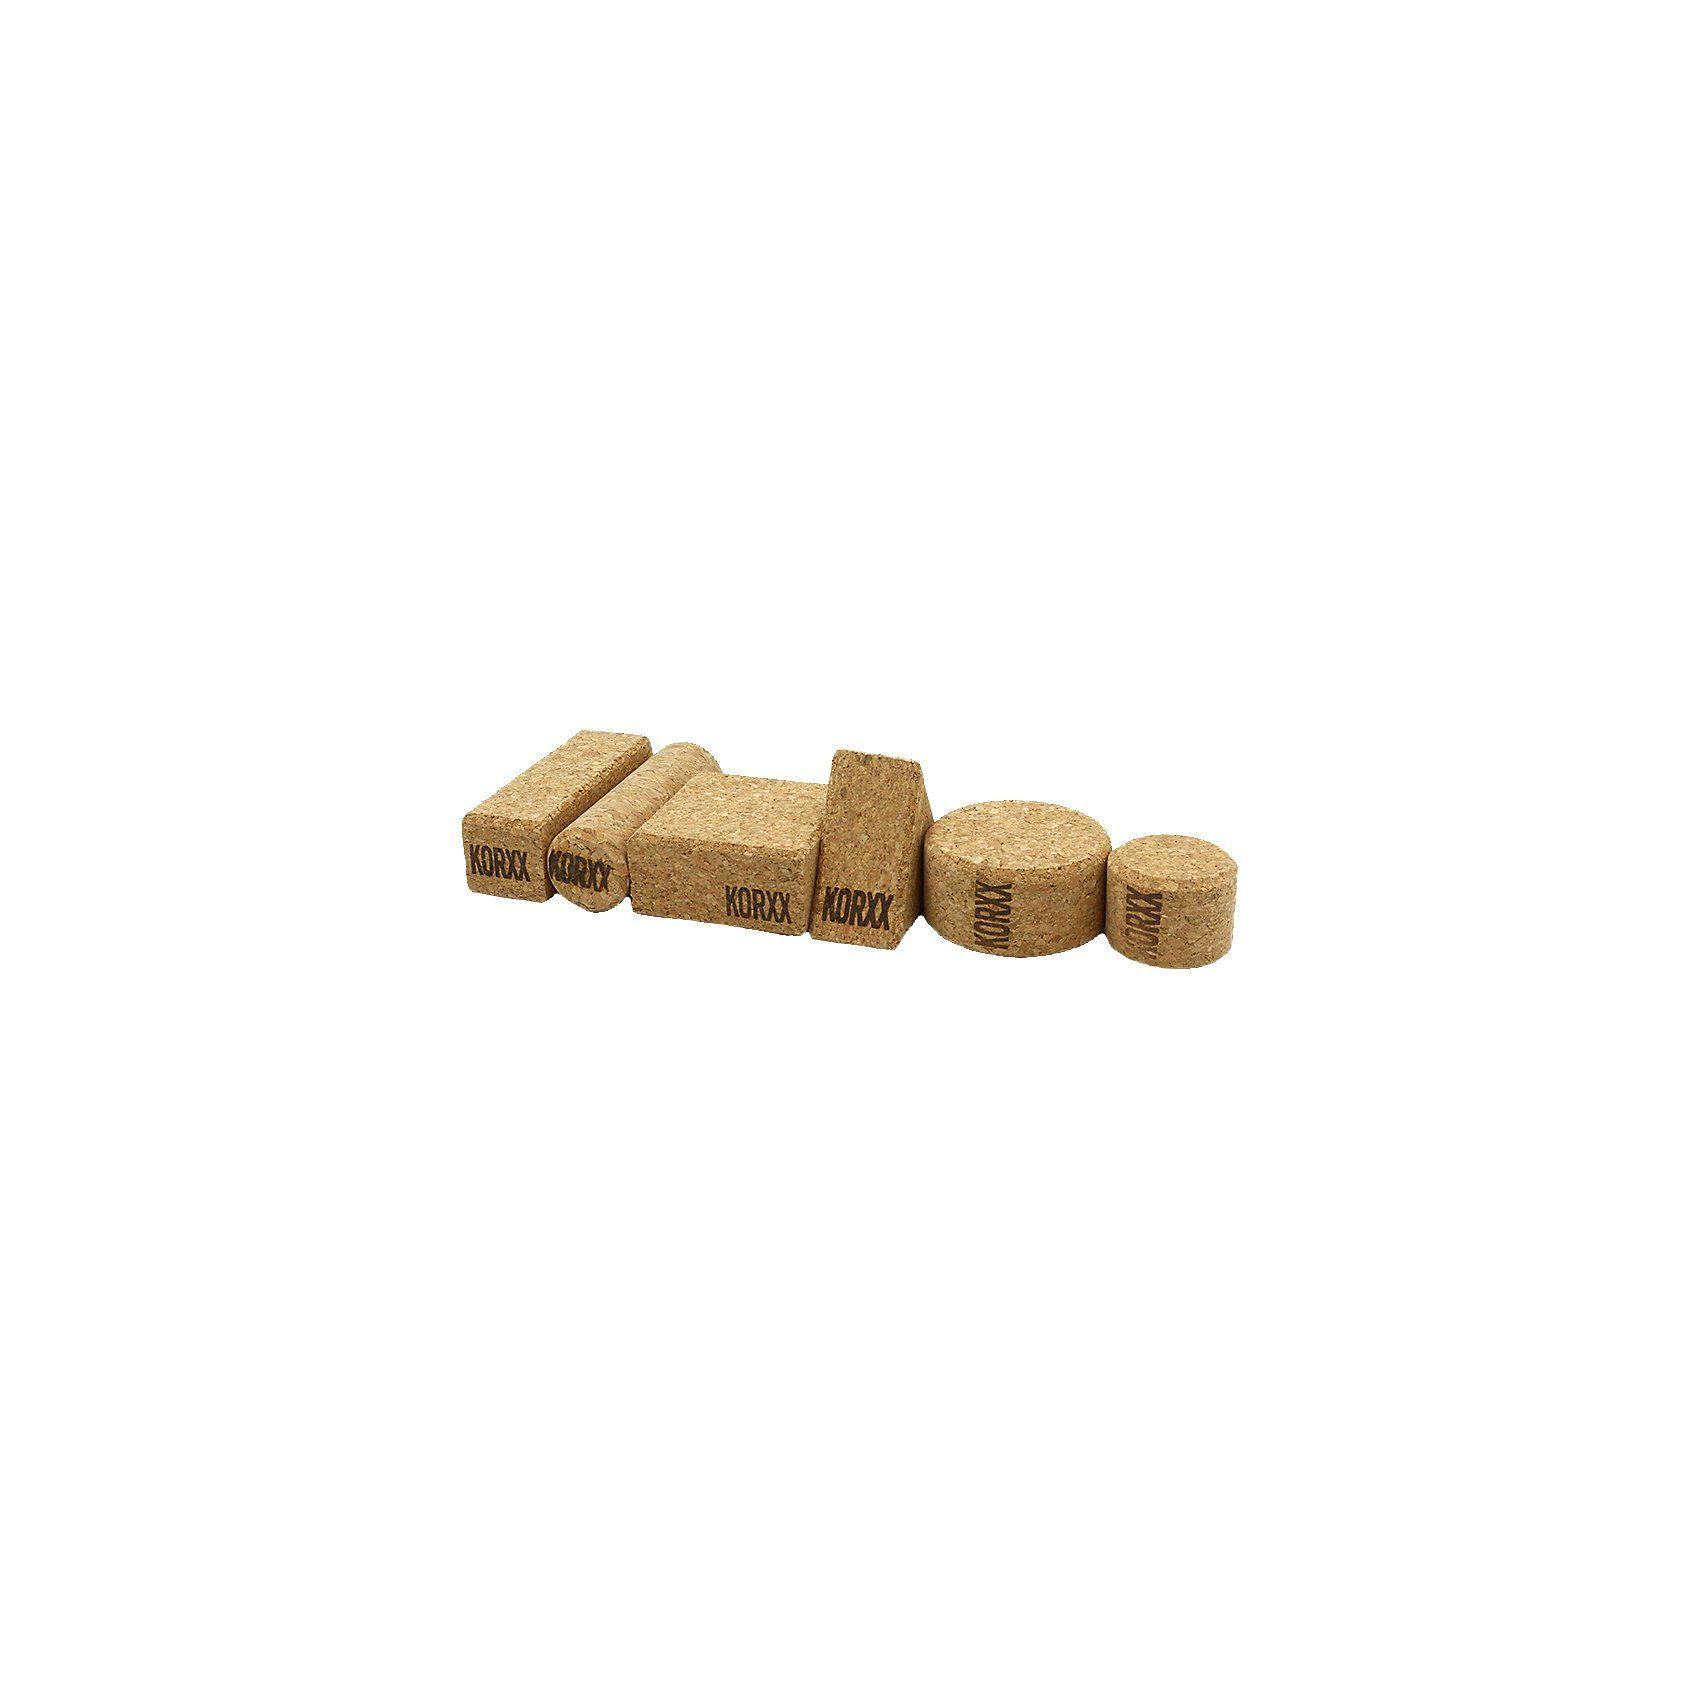 Korkbausteine Form Starter, 21 Stk.